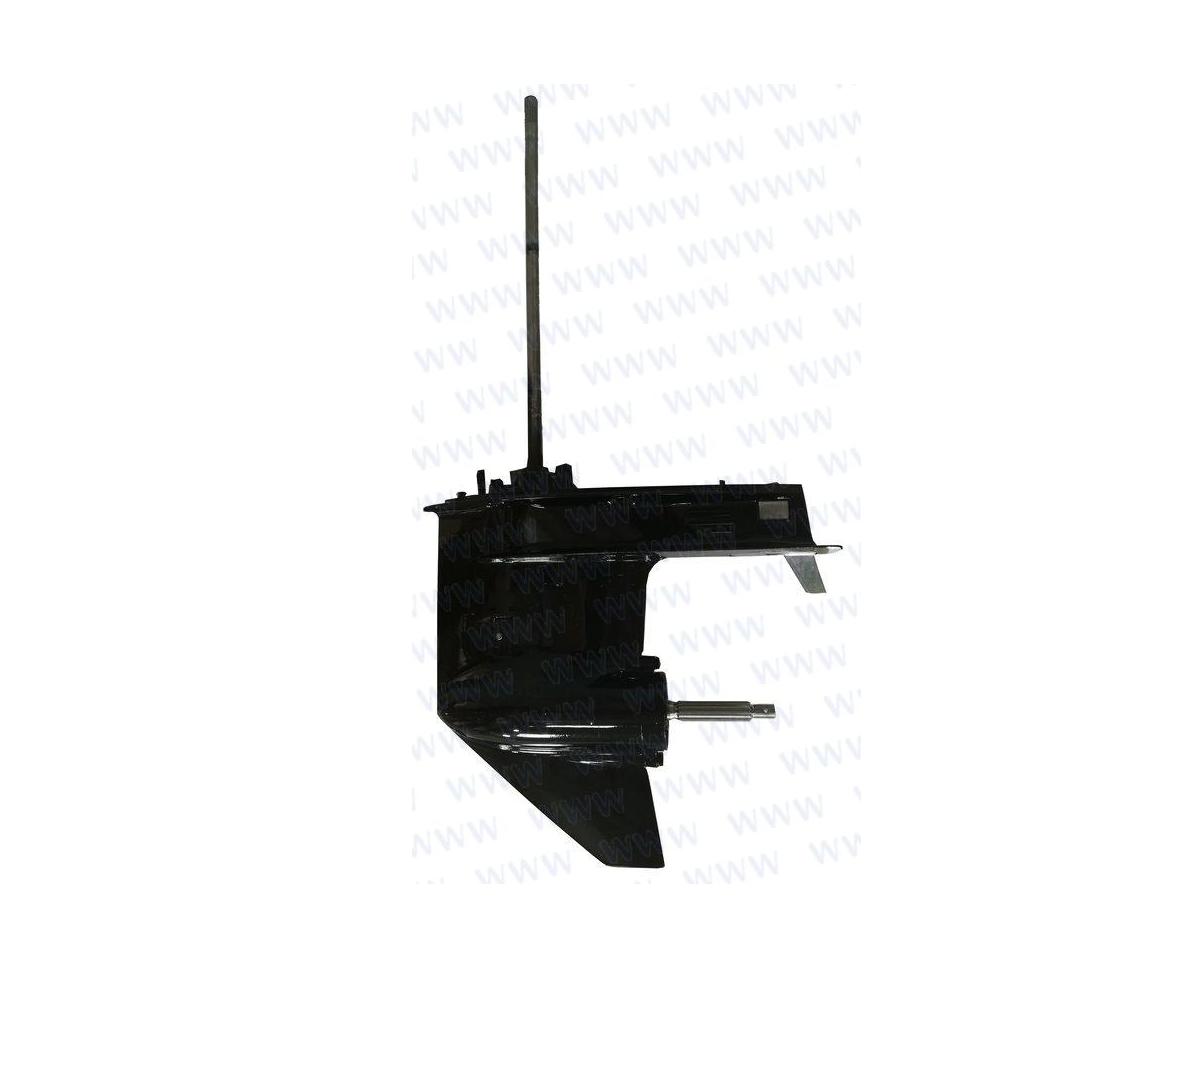 Yamaha/Parsun F50 & F60 LOWER CASING ASSY (69W-45300-00-4D, 69W-45300-00-8D, 69W-45300-01-8D)